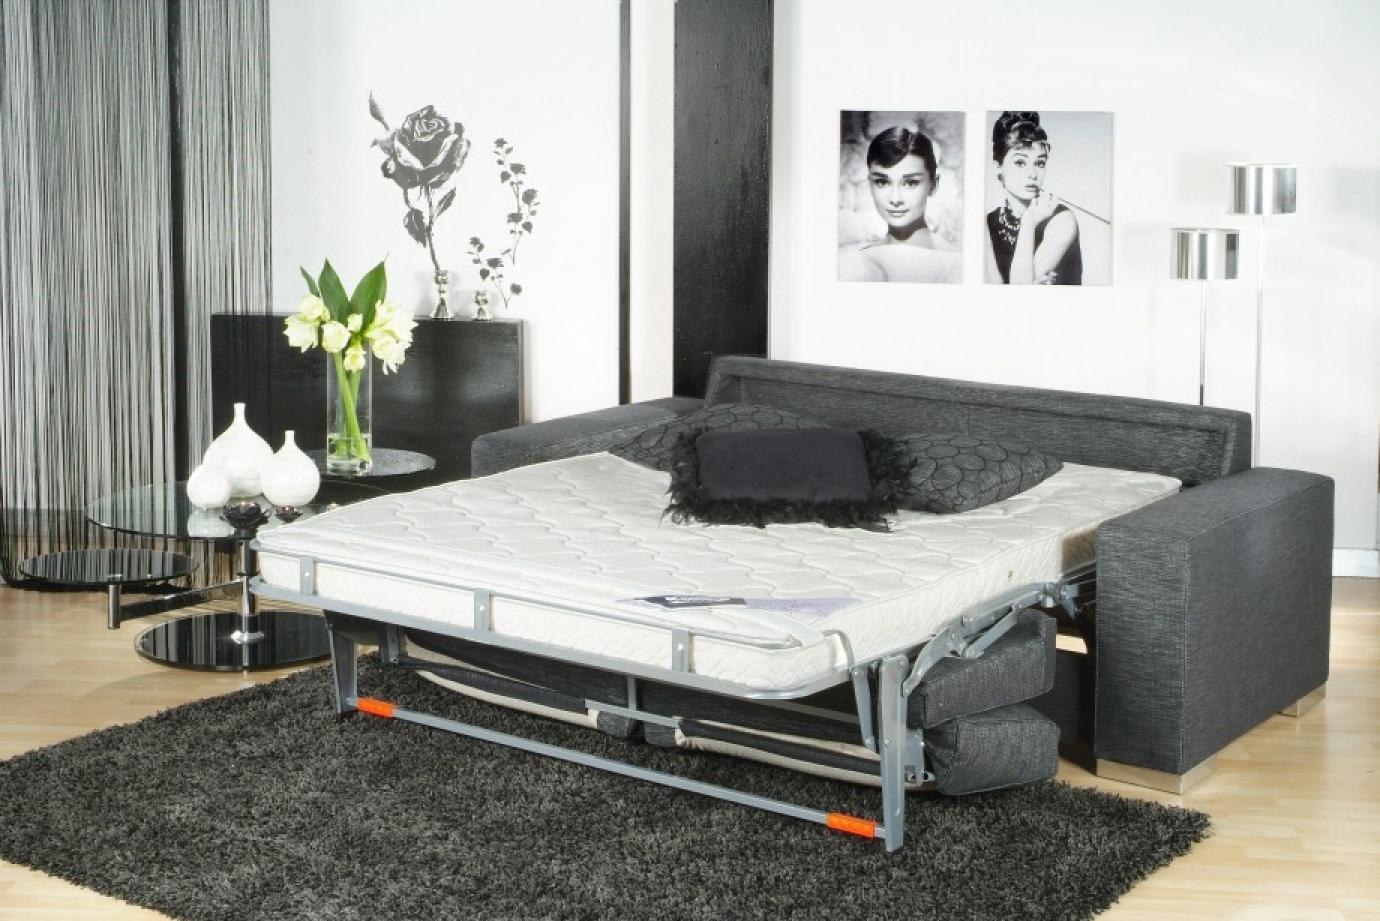 photos canap lit convertible avec vrai matelas. Black Bedroom Furniture Sets. Home Design Ideas